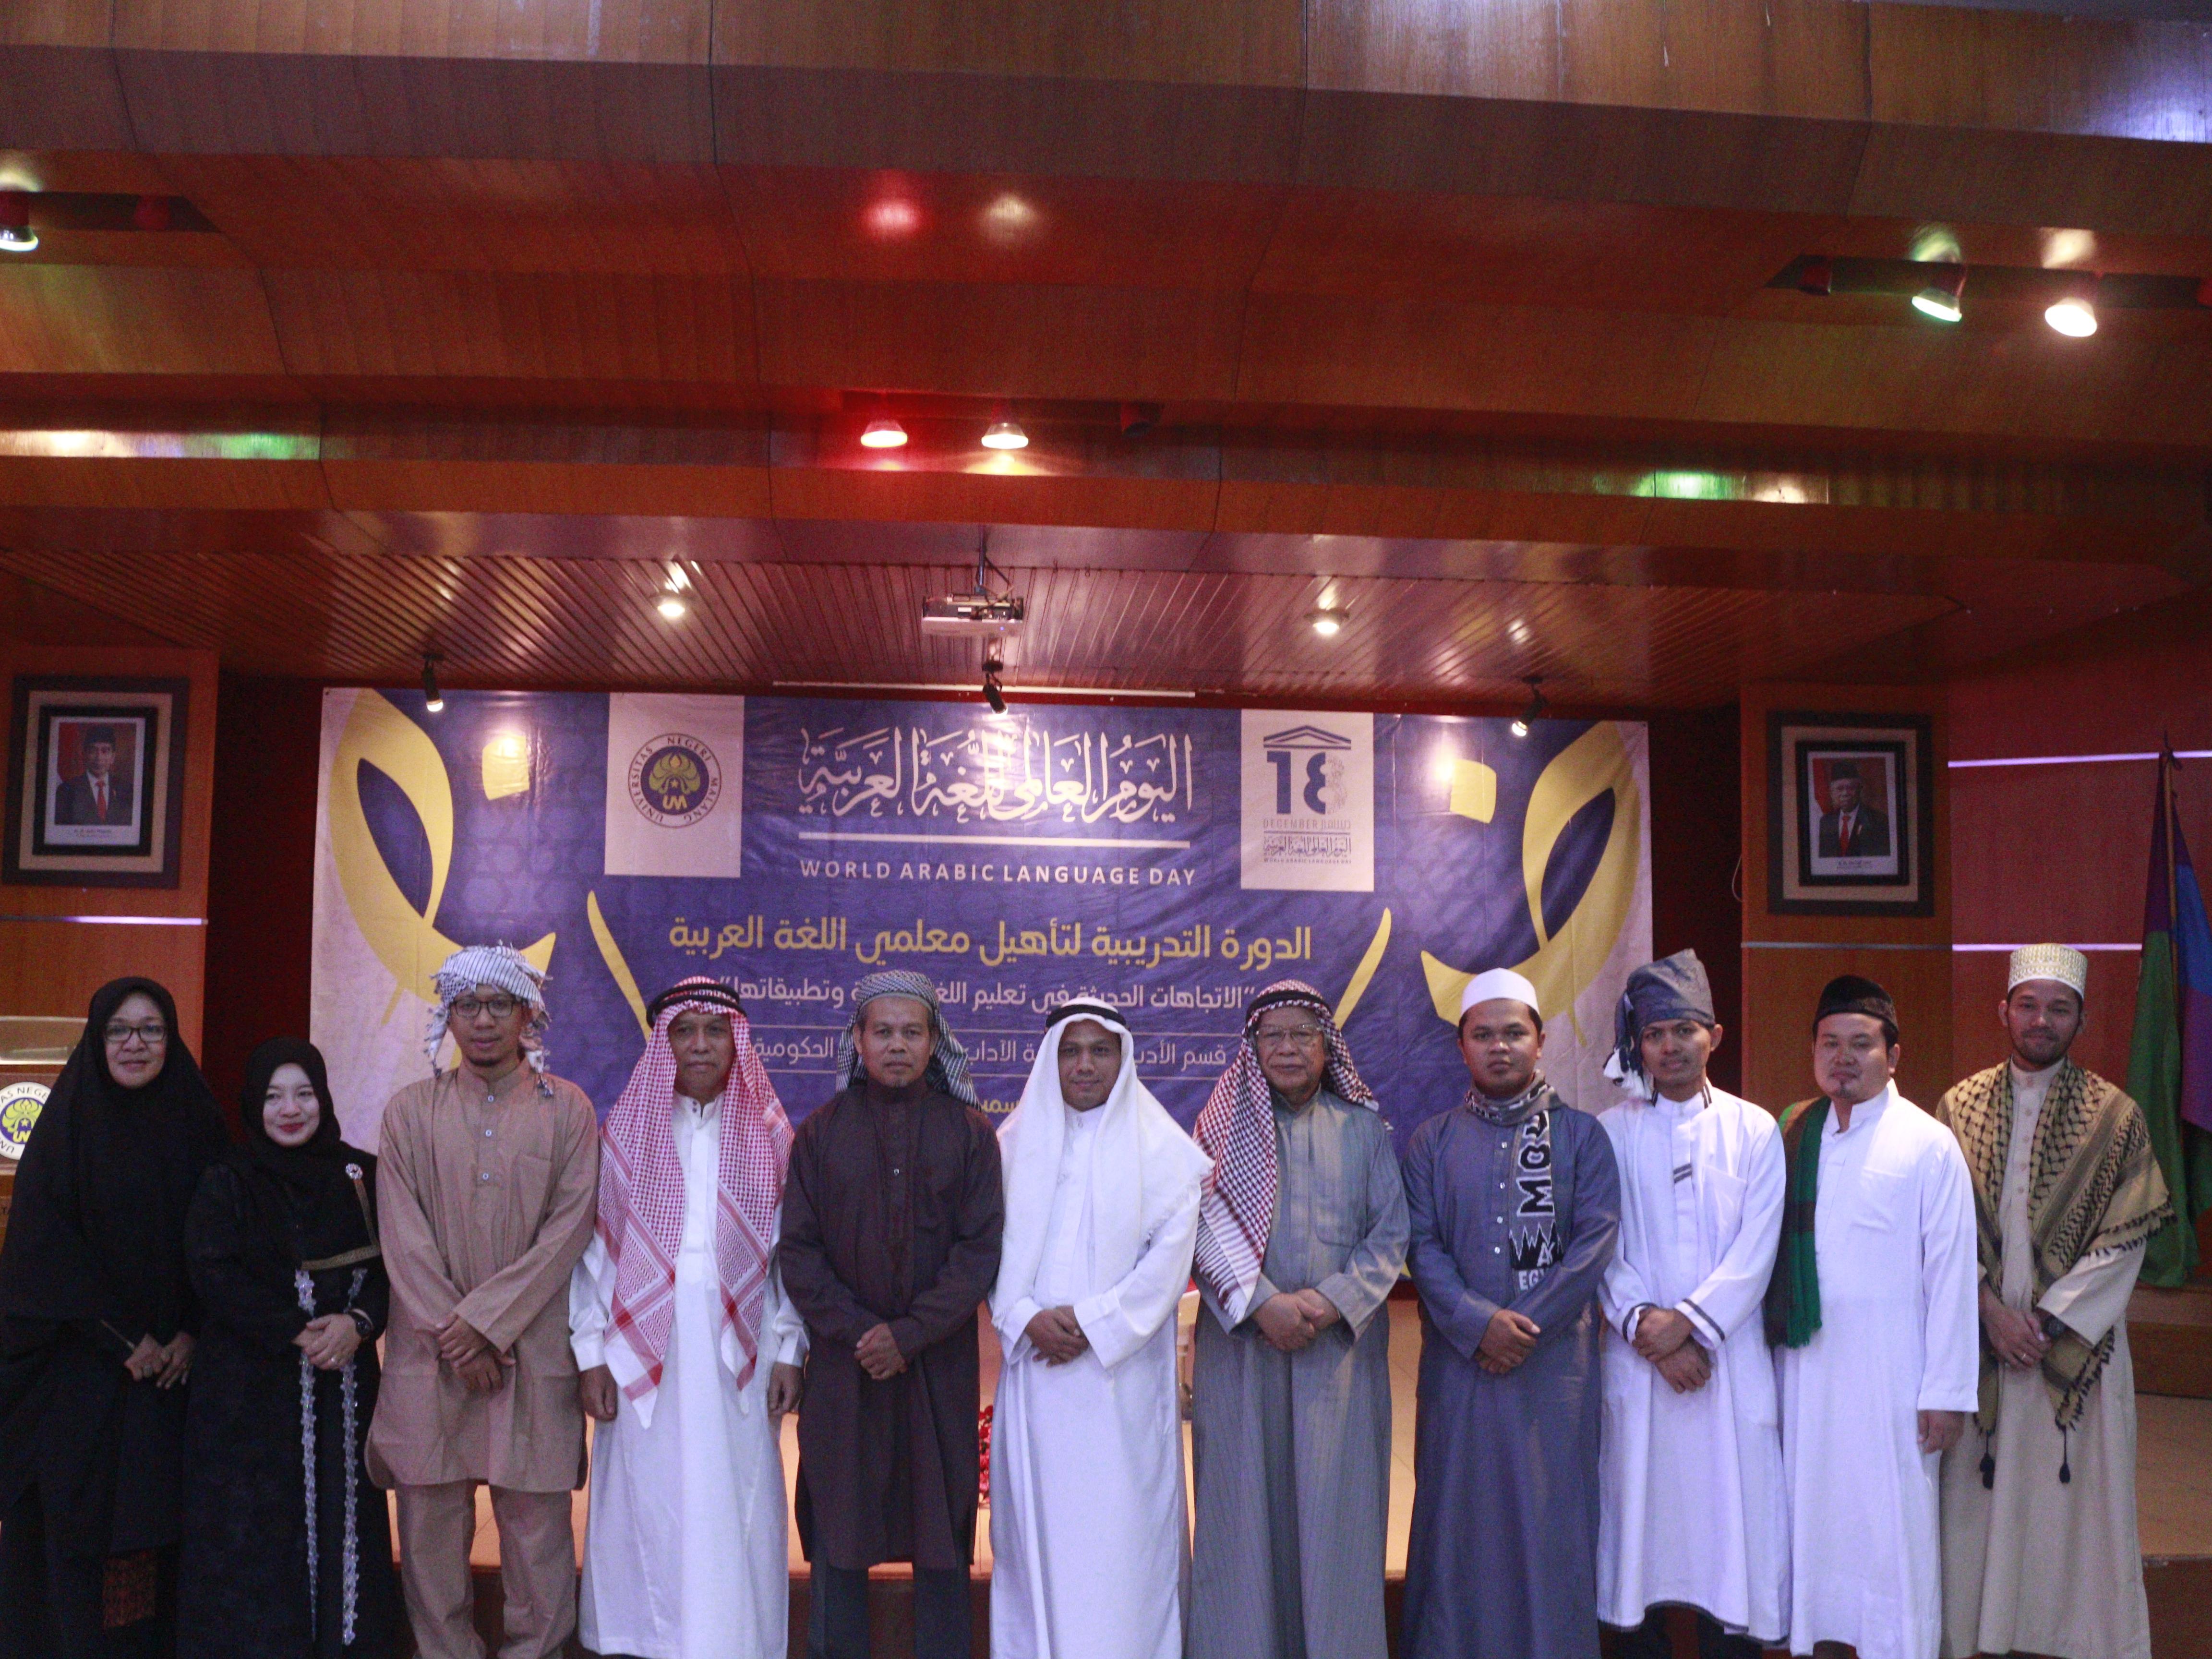 HARI BAHASA ARAB DUNIA احتفال اليوم العالمي للغة العربية بجامعة مالانج الحكومية- إندونيسيا 18-12-2019 الدورة التدريبية لتأهيل معلمي اللغة العربية